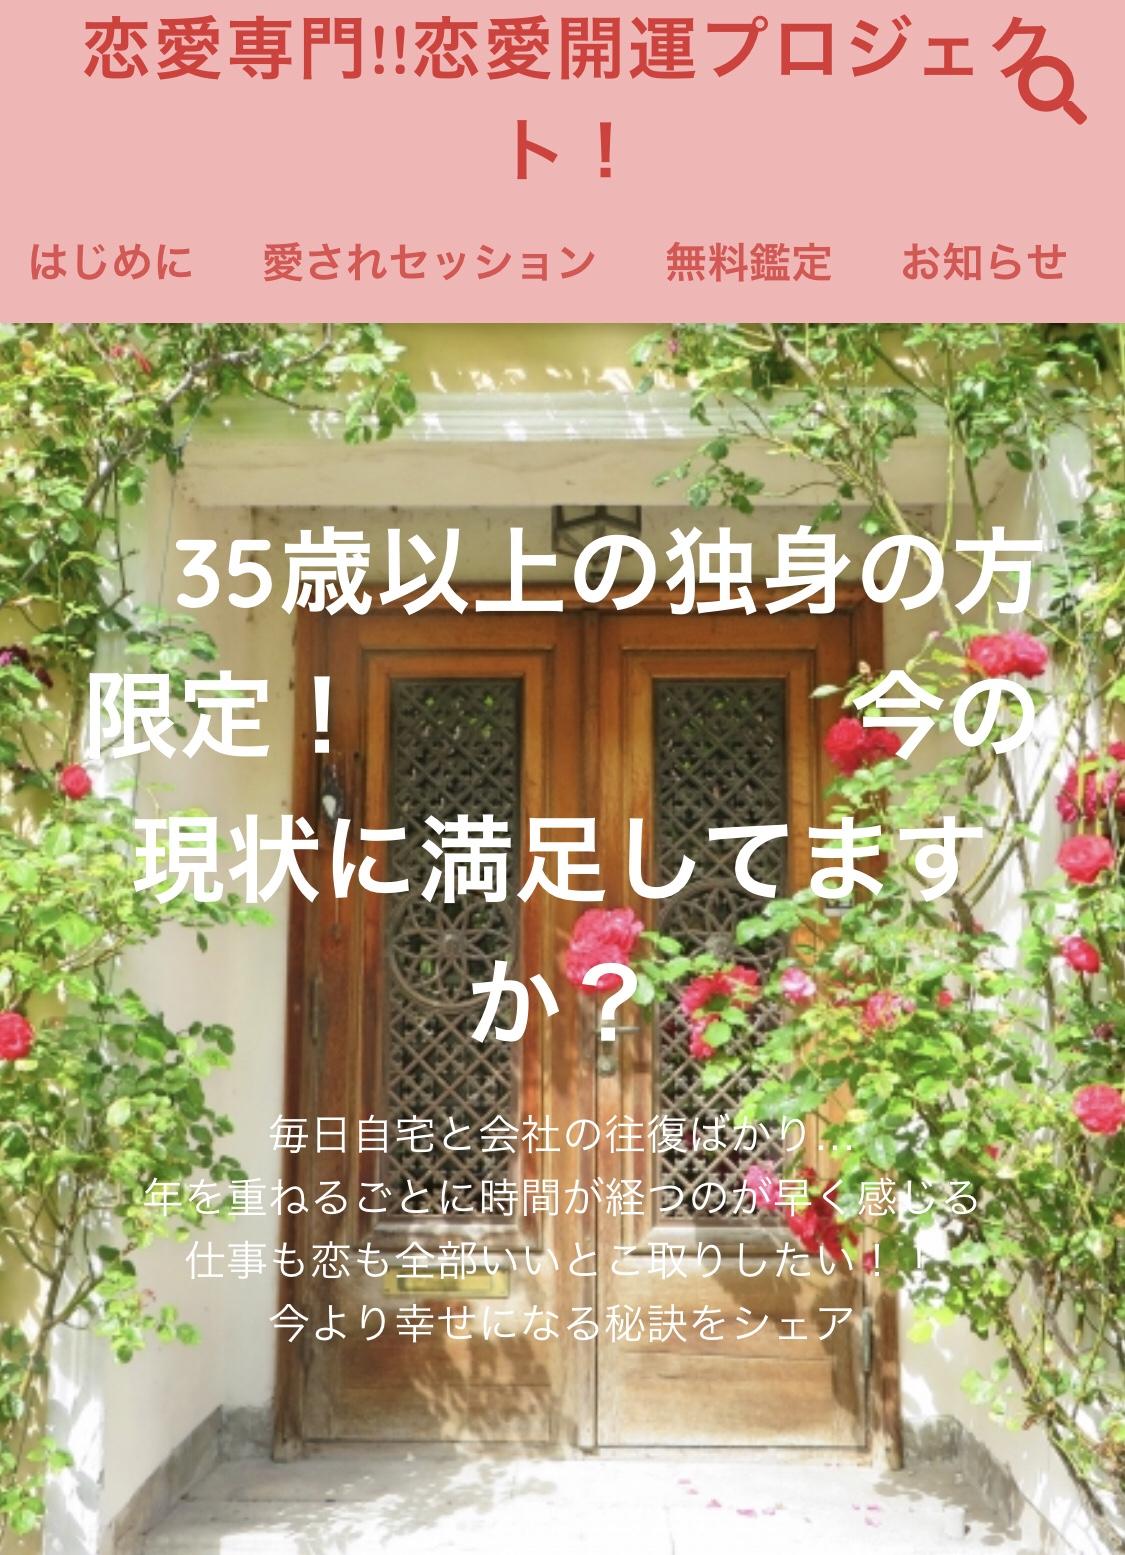 img 7946 1 - 癒しスタジアムIN大阪vol.59